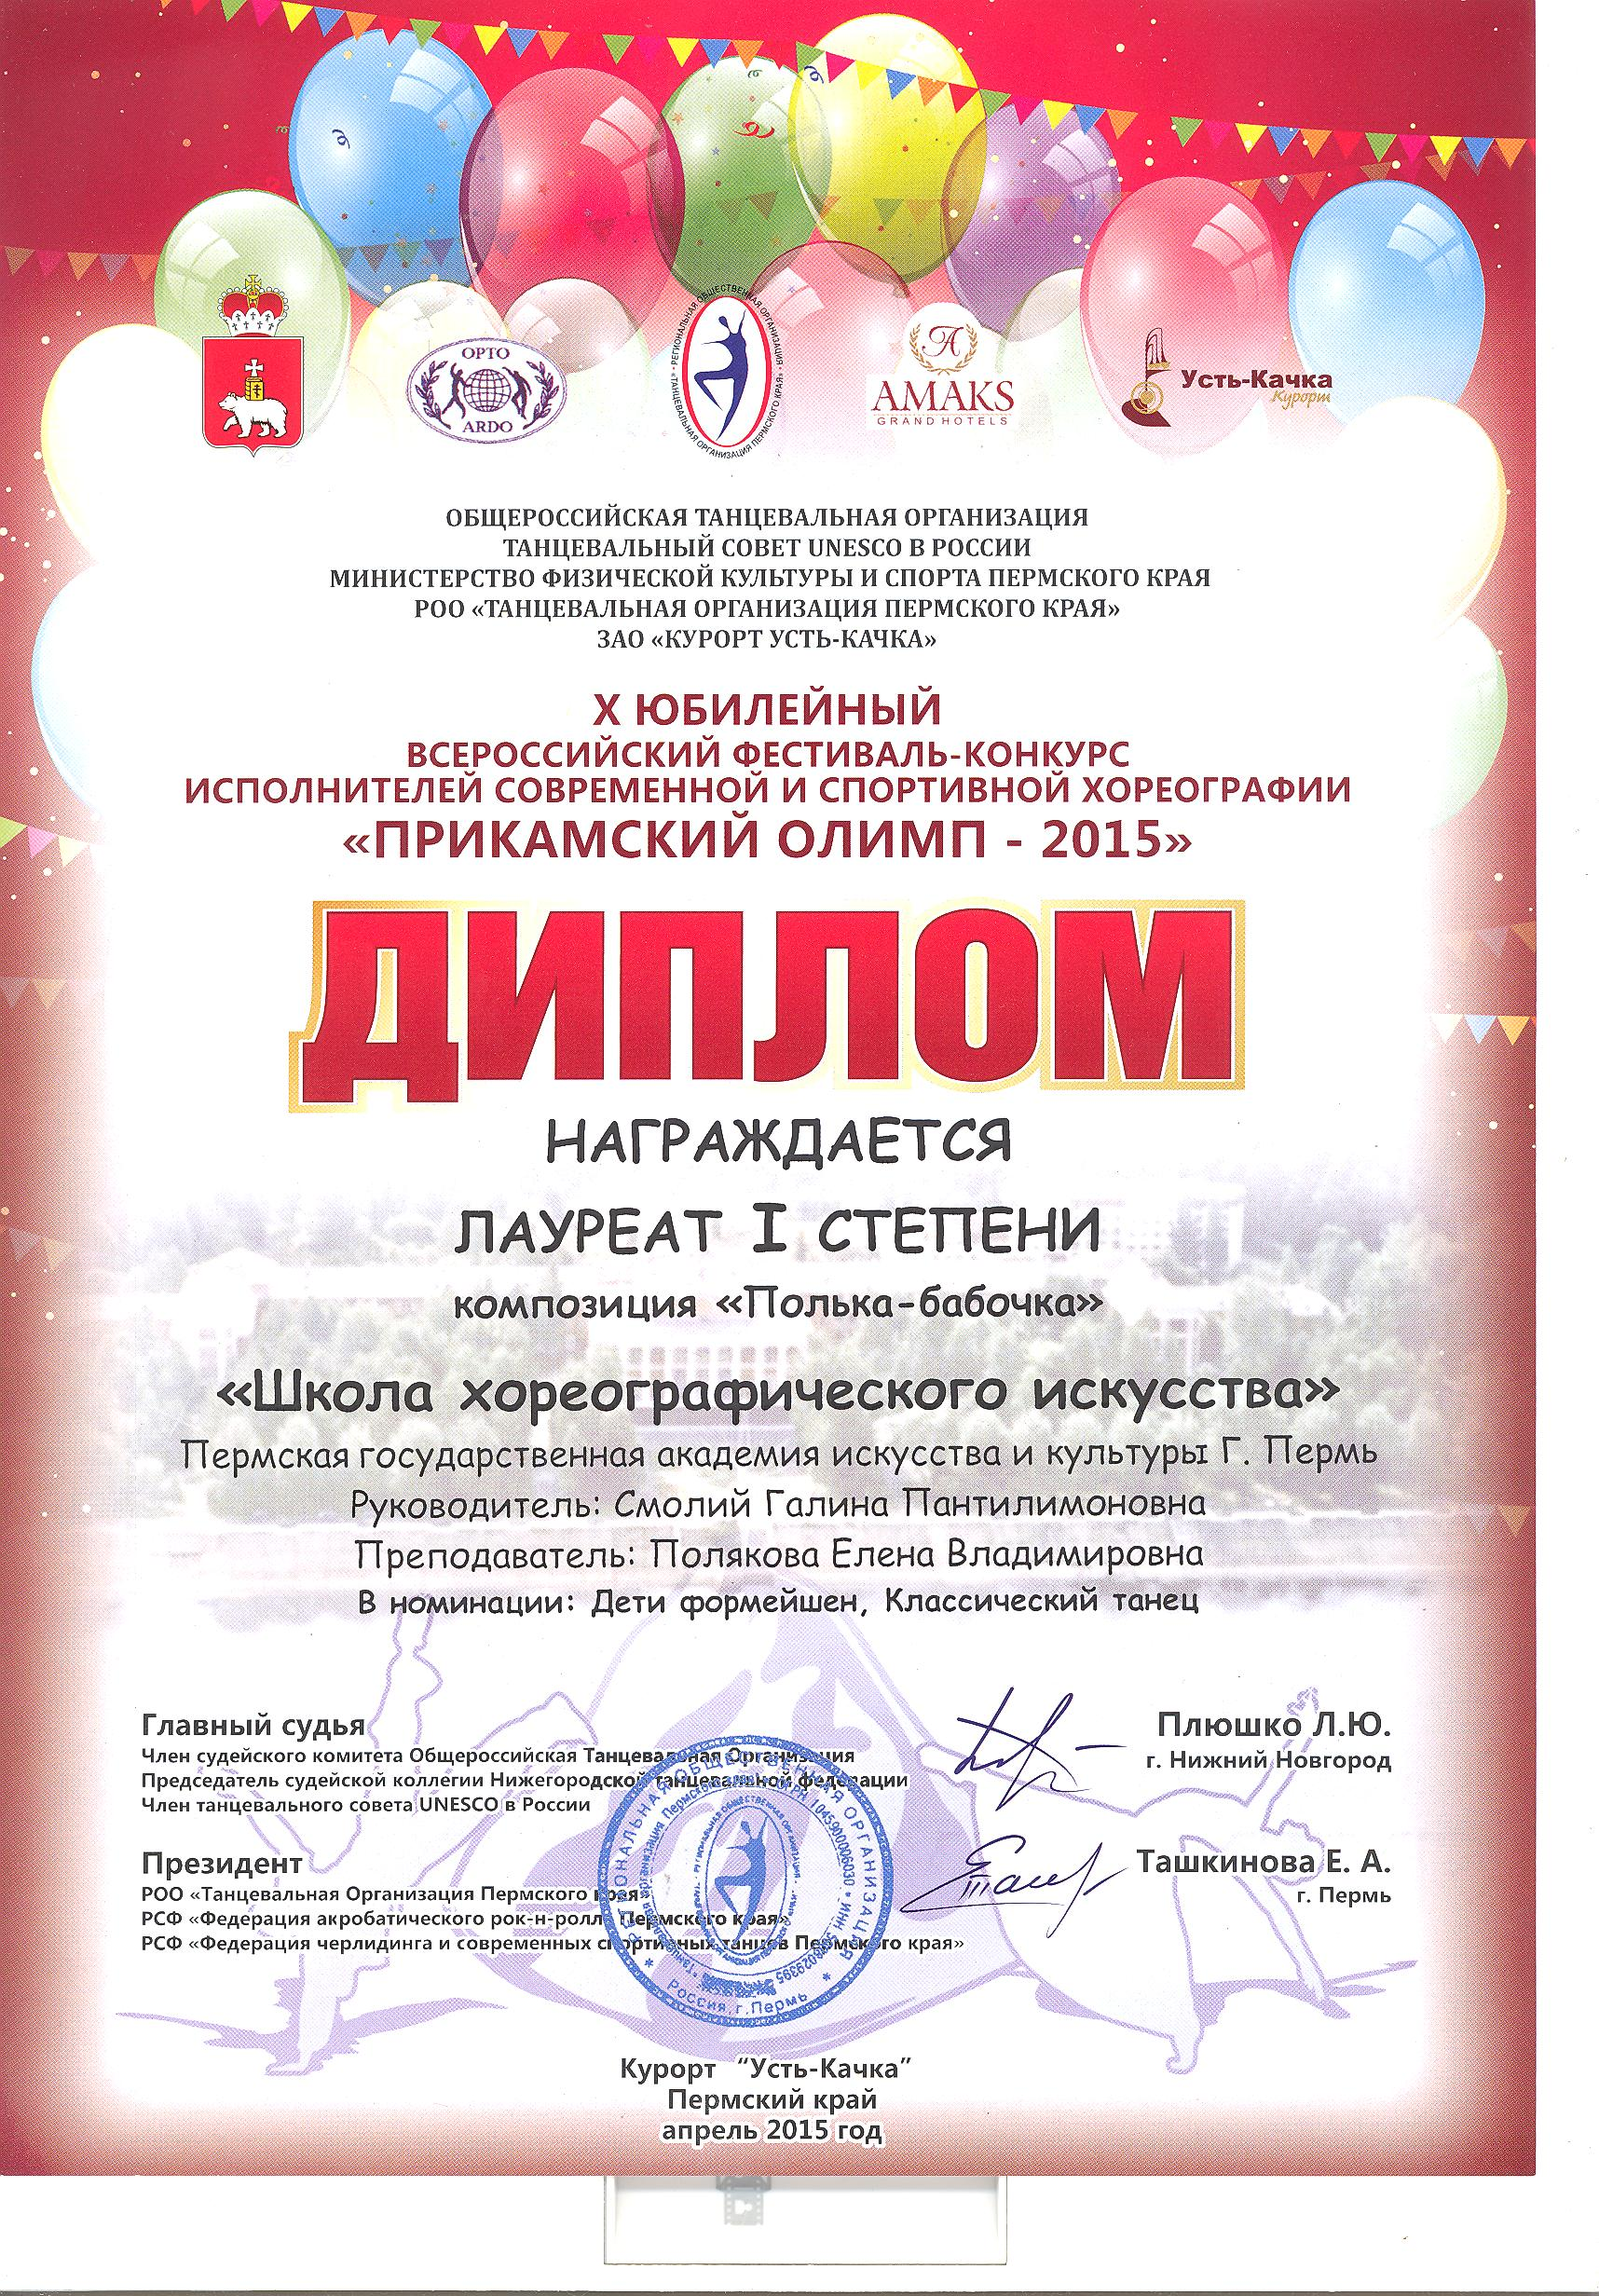 Лауреат 1 степени-ШХИ, 2015.jpg